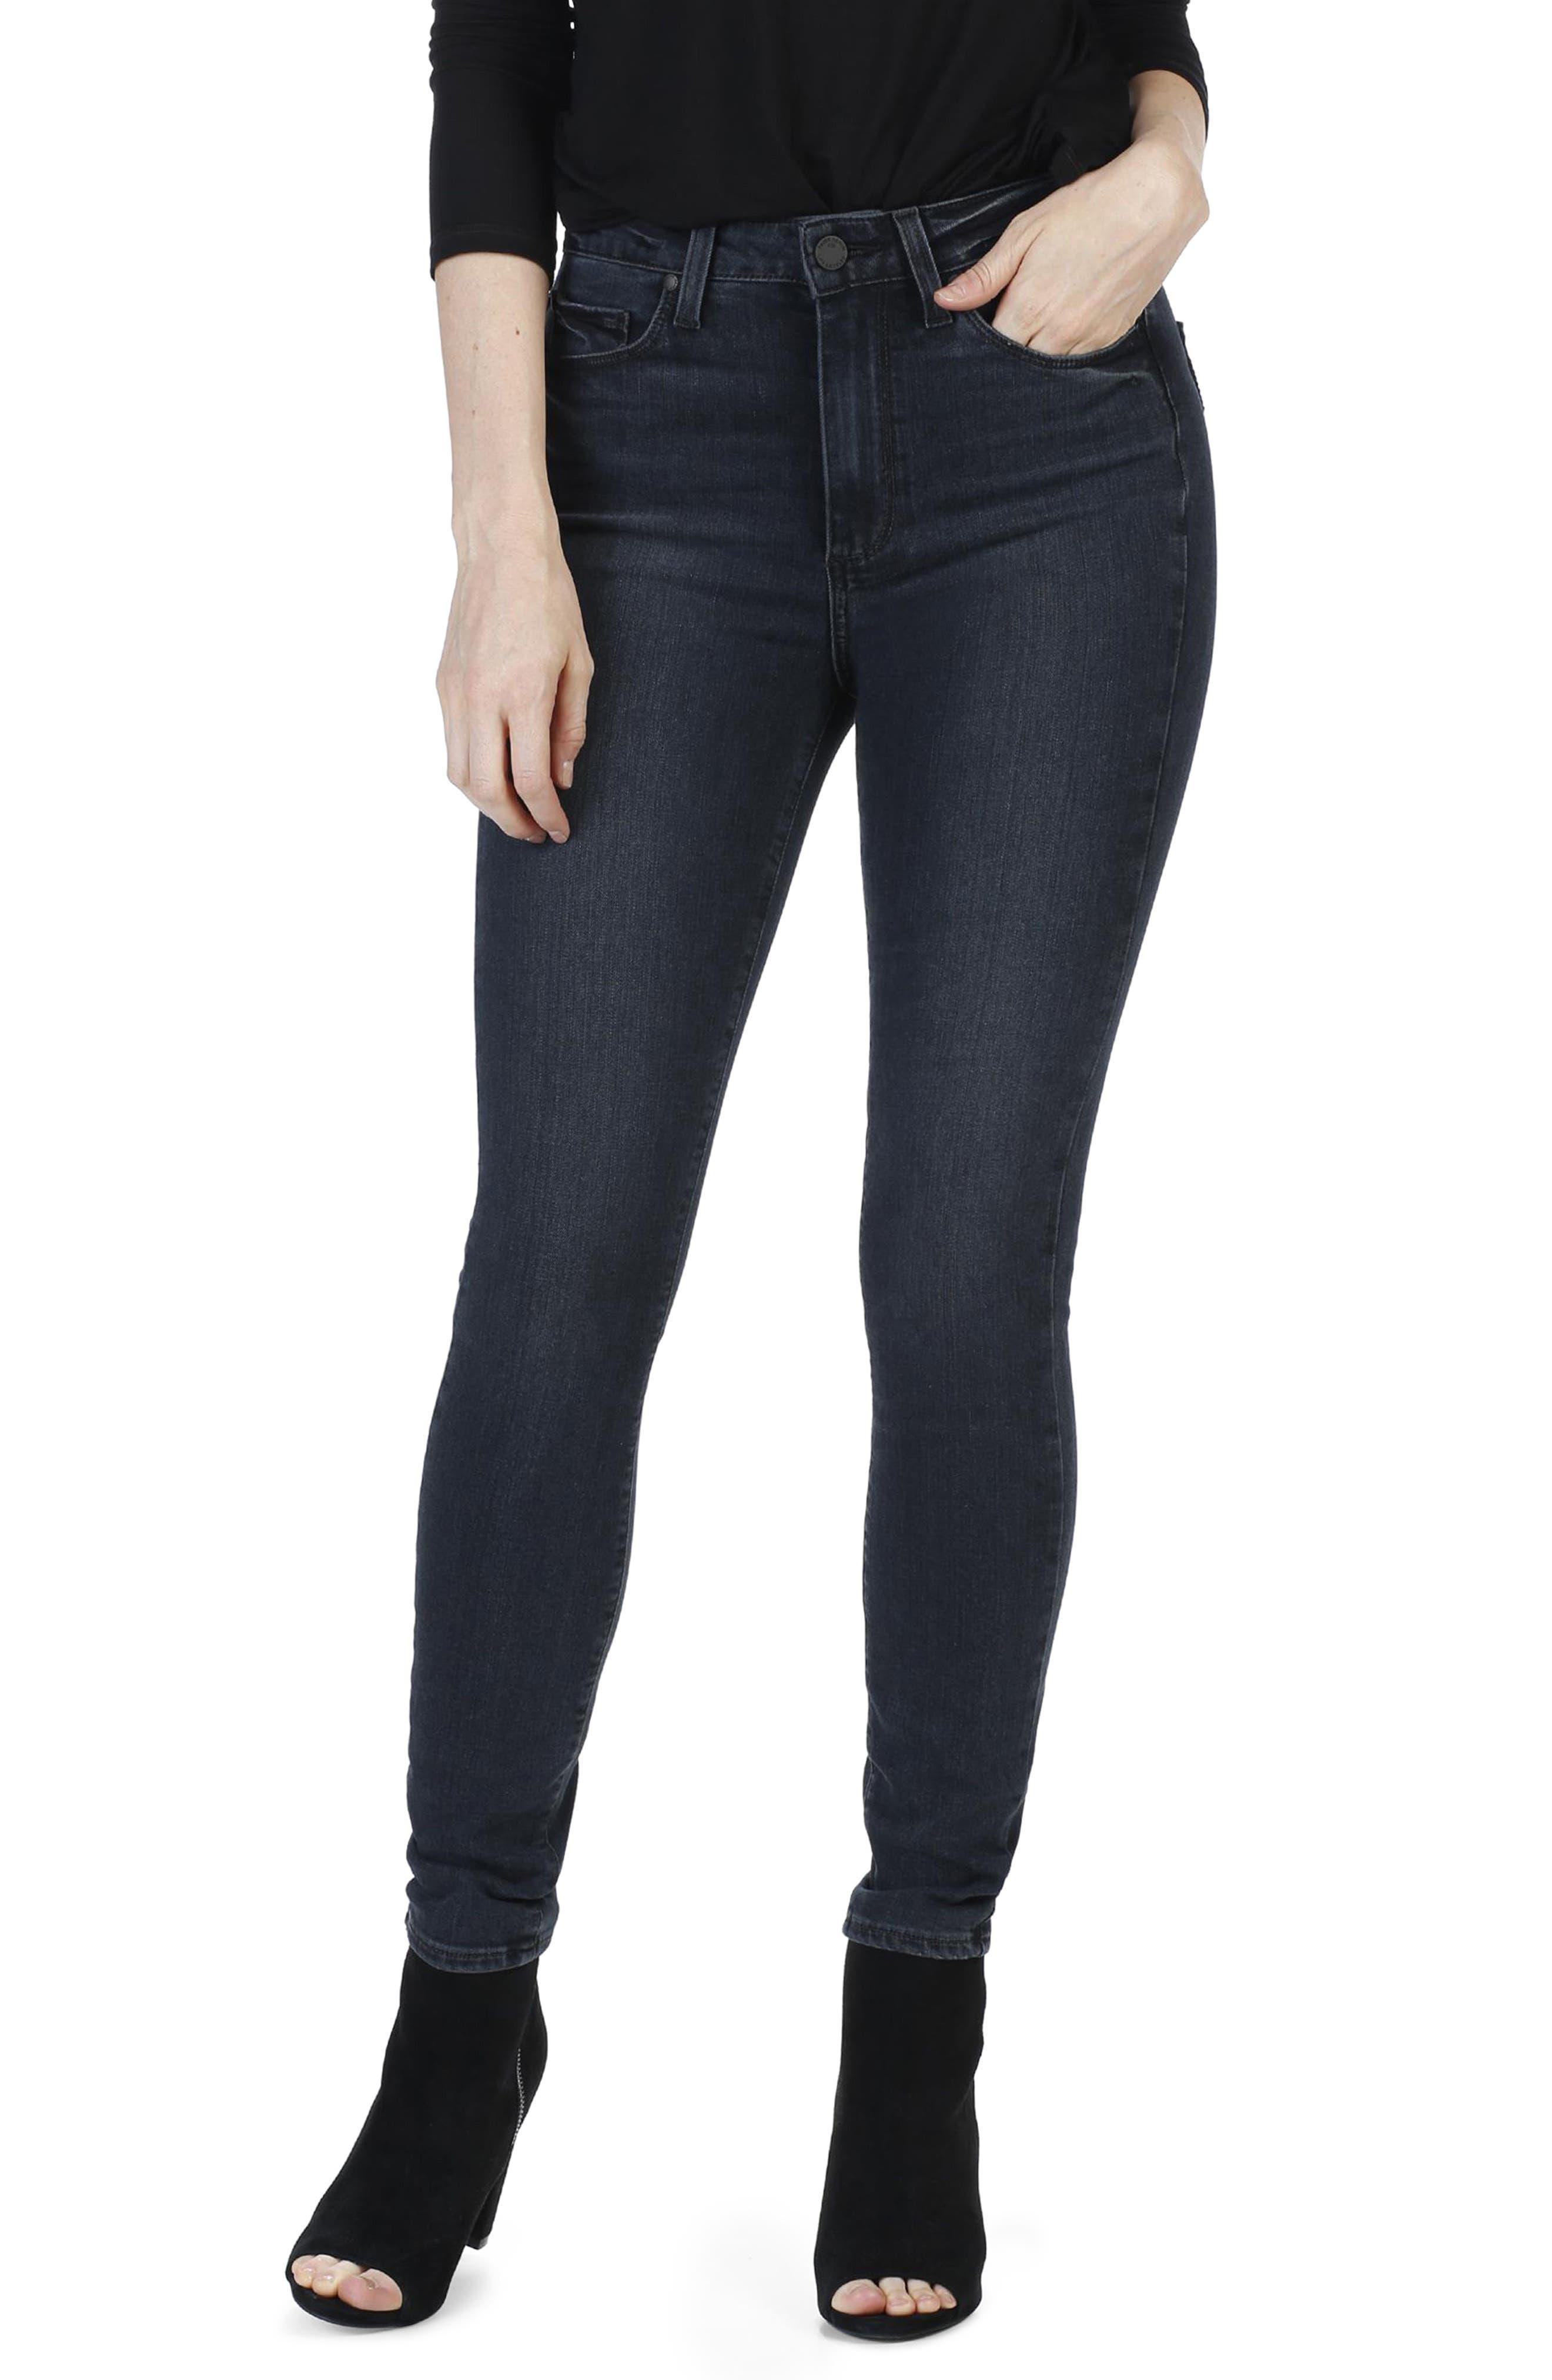 Transcend - Margot Ultra Skinny Jeans,                             Main thumbnail 1, color,                             400